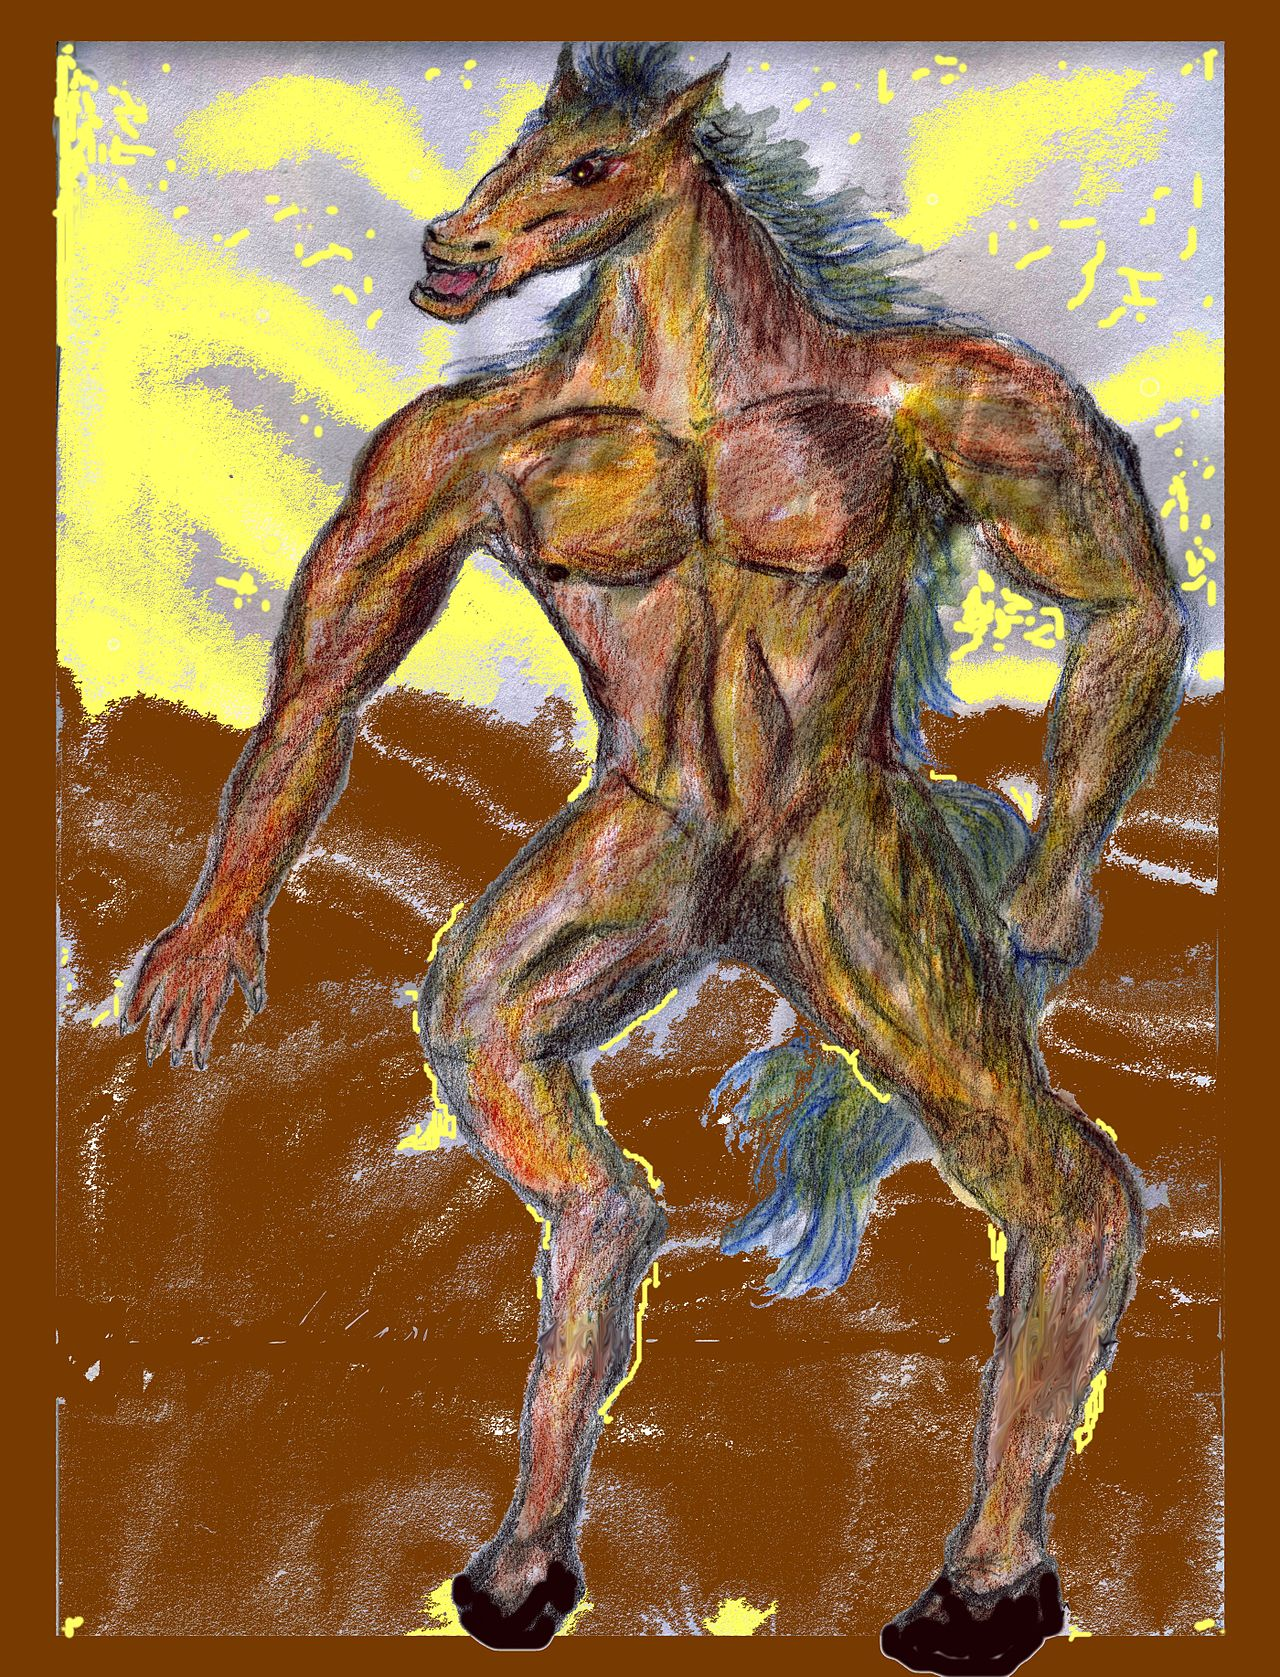 1280px-Tikbalang_The_Philippine_Demon_Horse_Commons.jpg